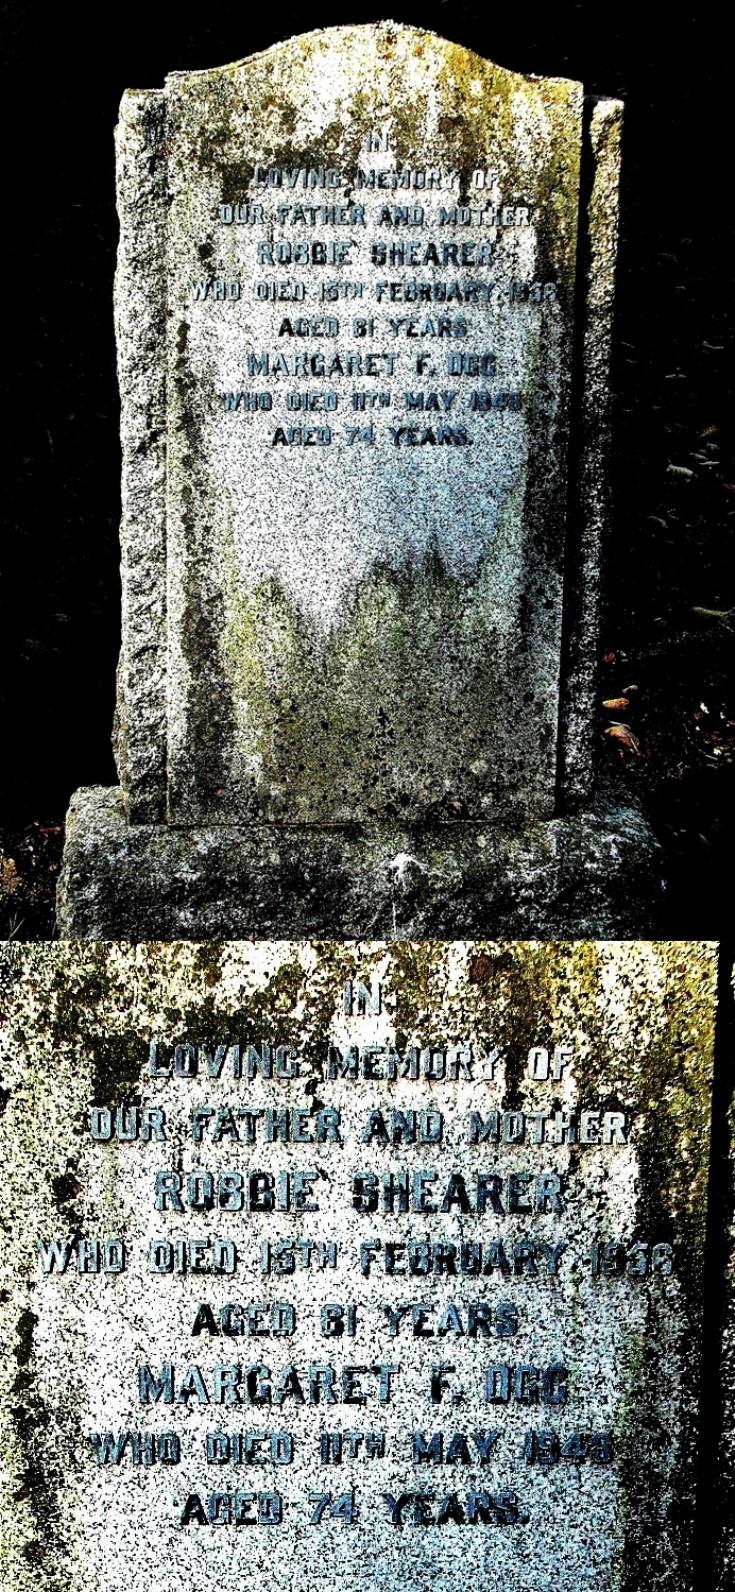 8 Grave Stone No 5 Robbie Shearer & Margaret Ogg